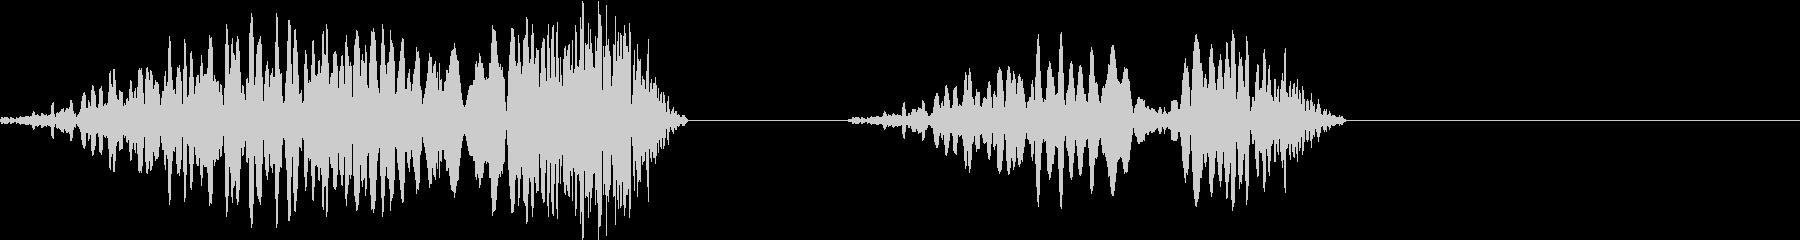 DJプレイ スクラッチ・ノイズ 176の未再生の波形